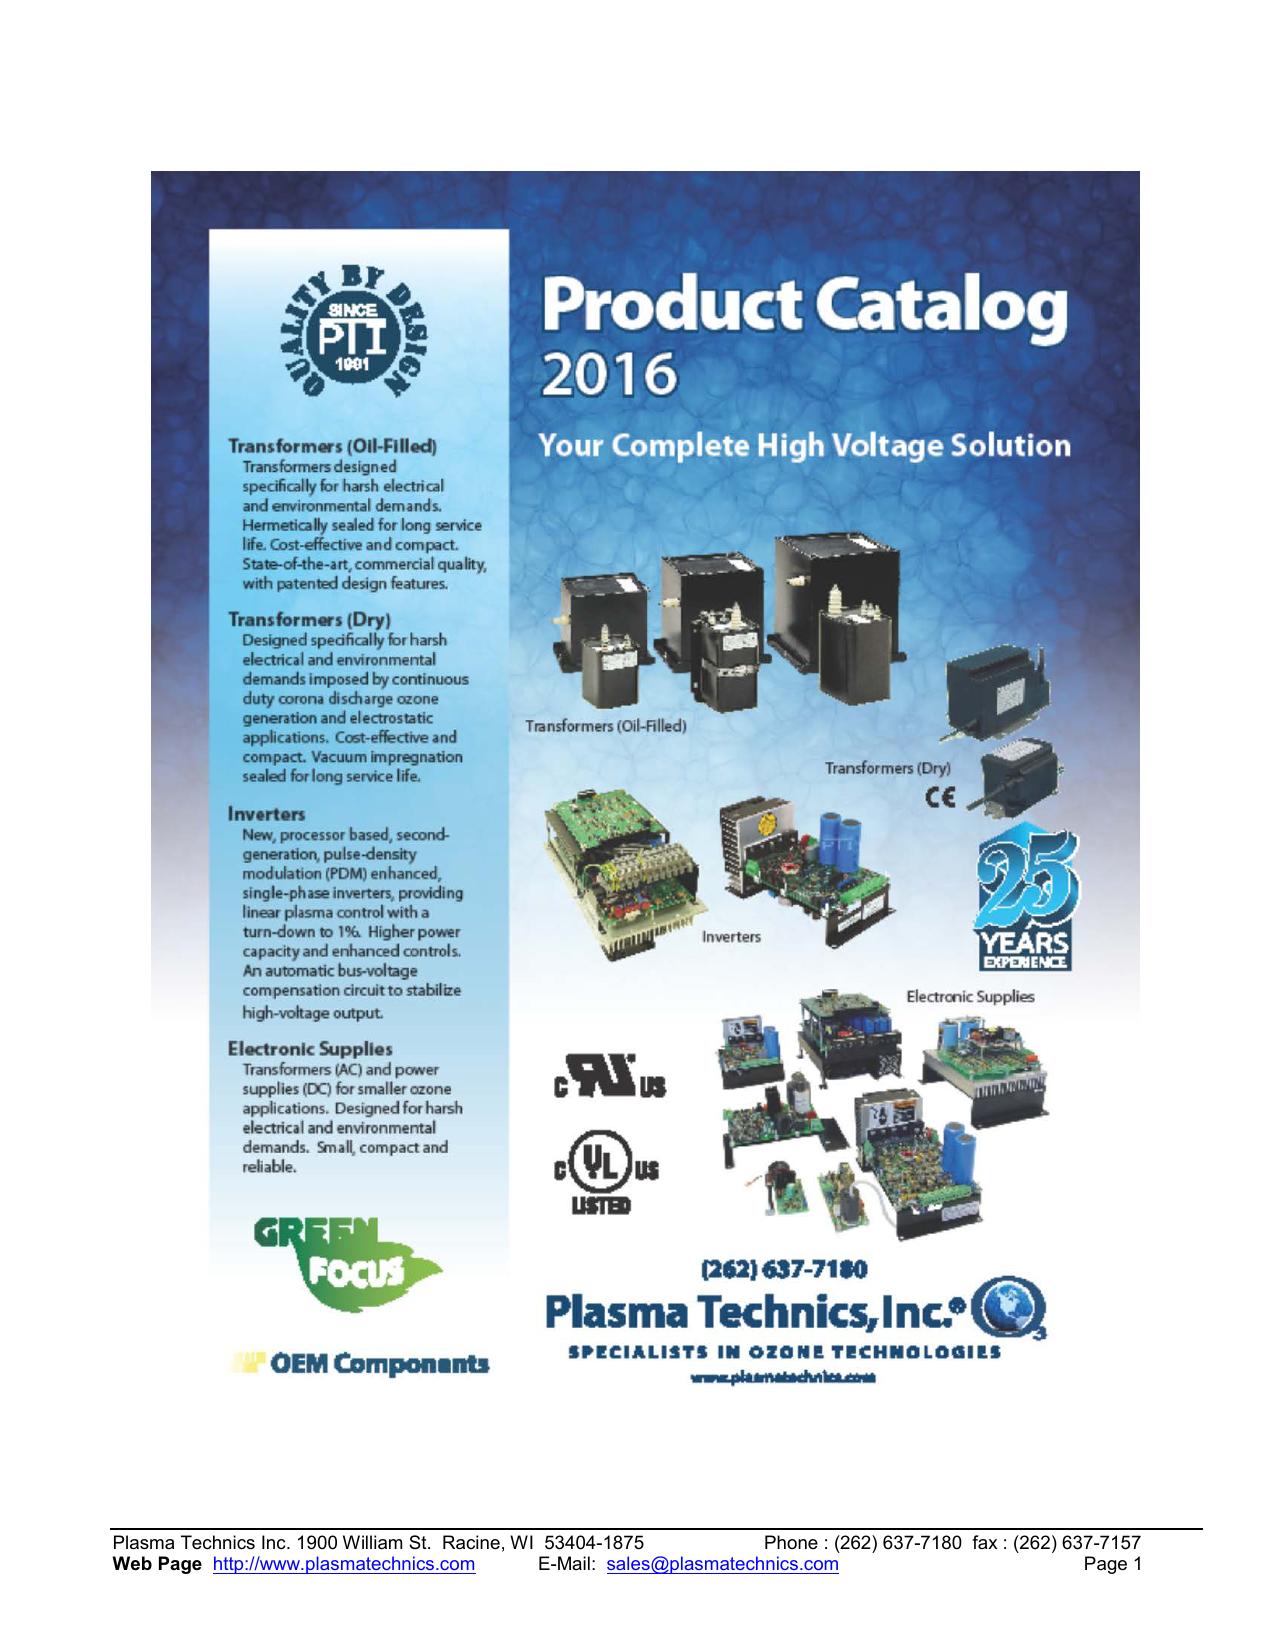 Product catalog - Plasma Technics | manualzz com